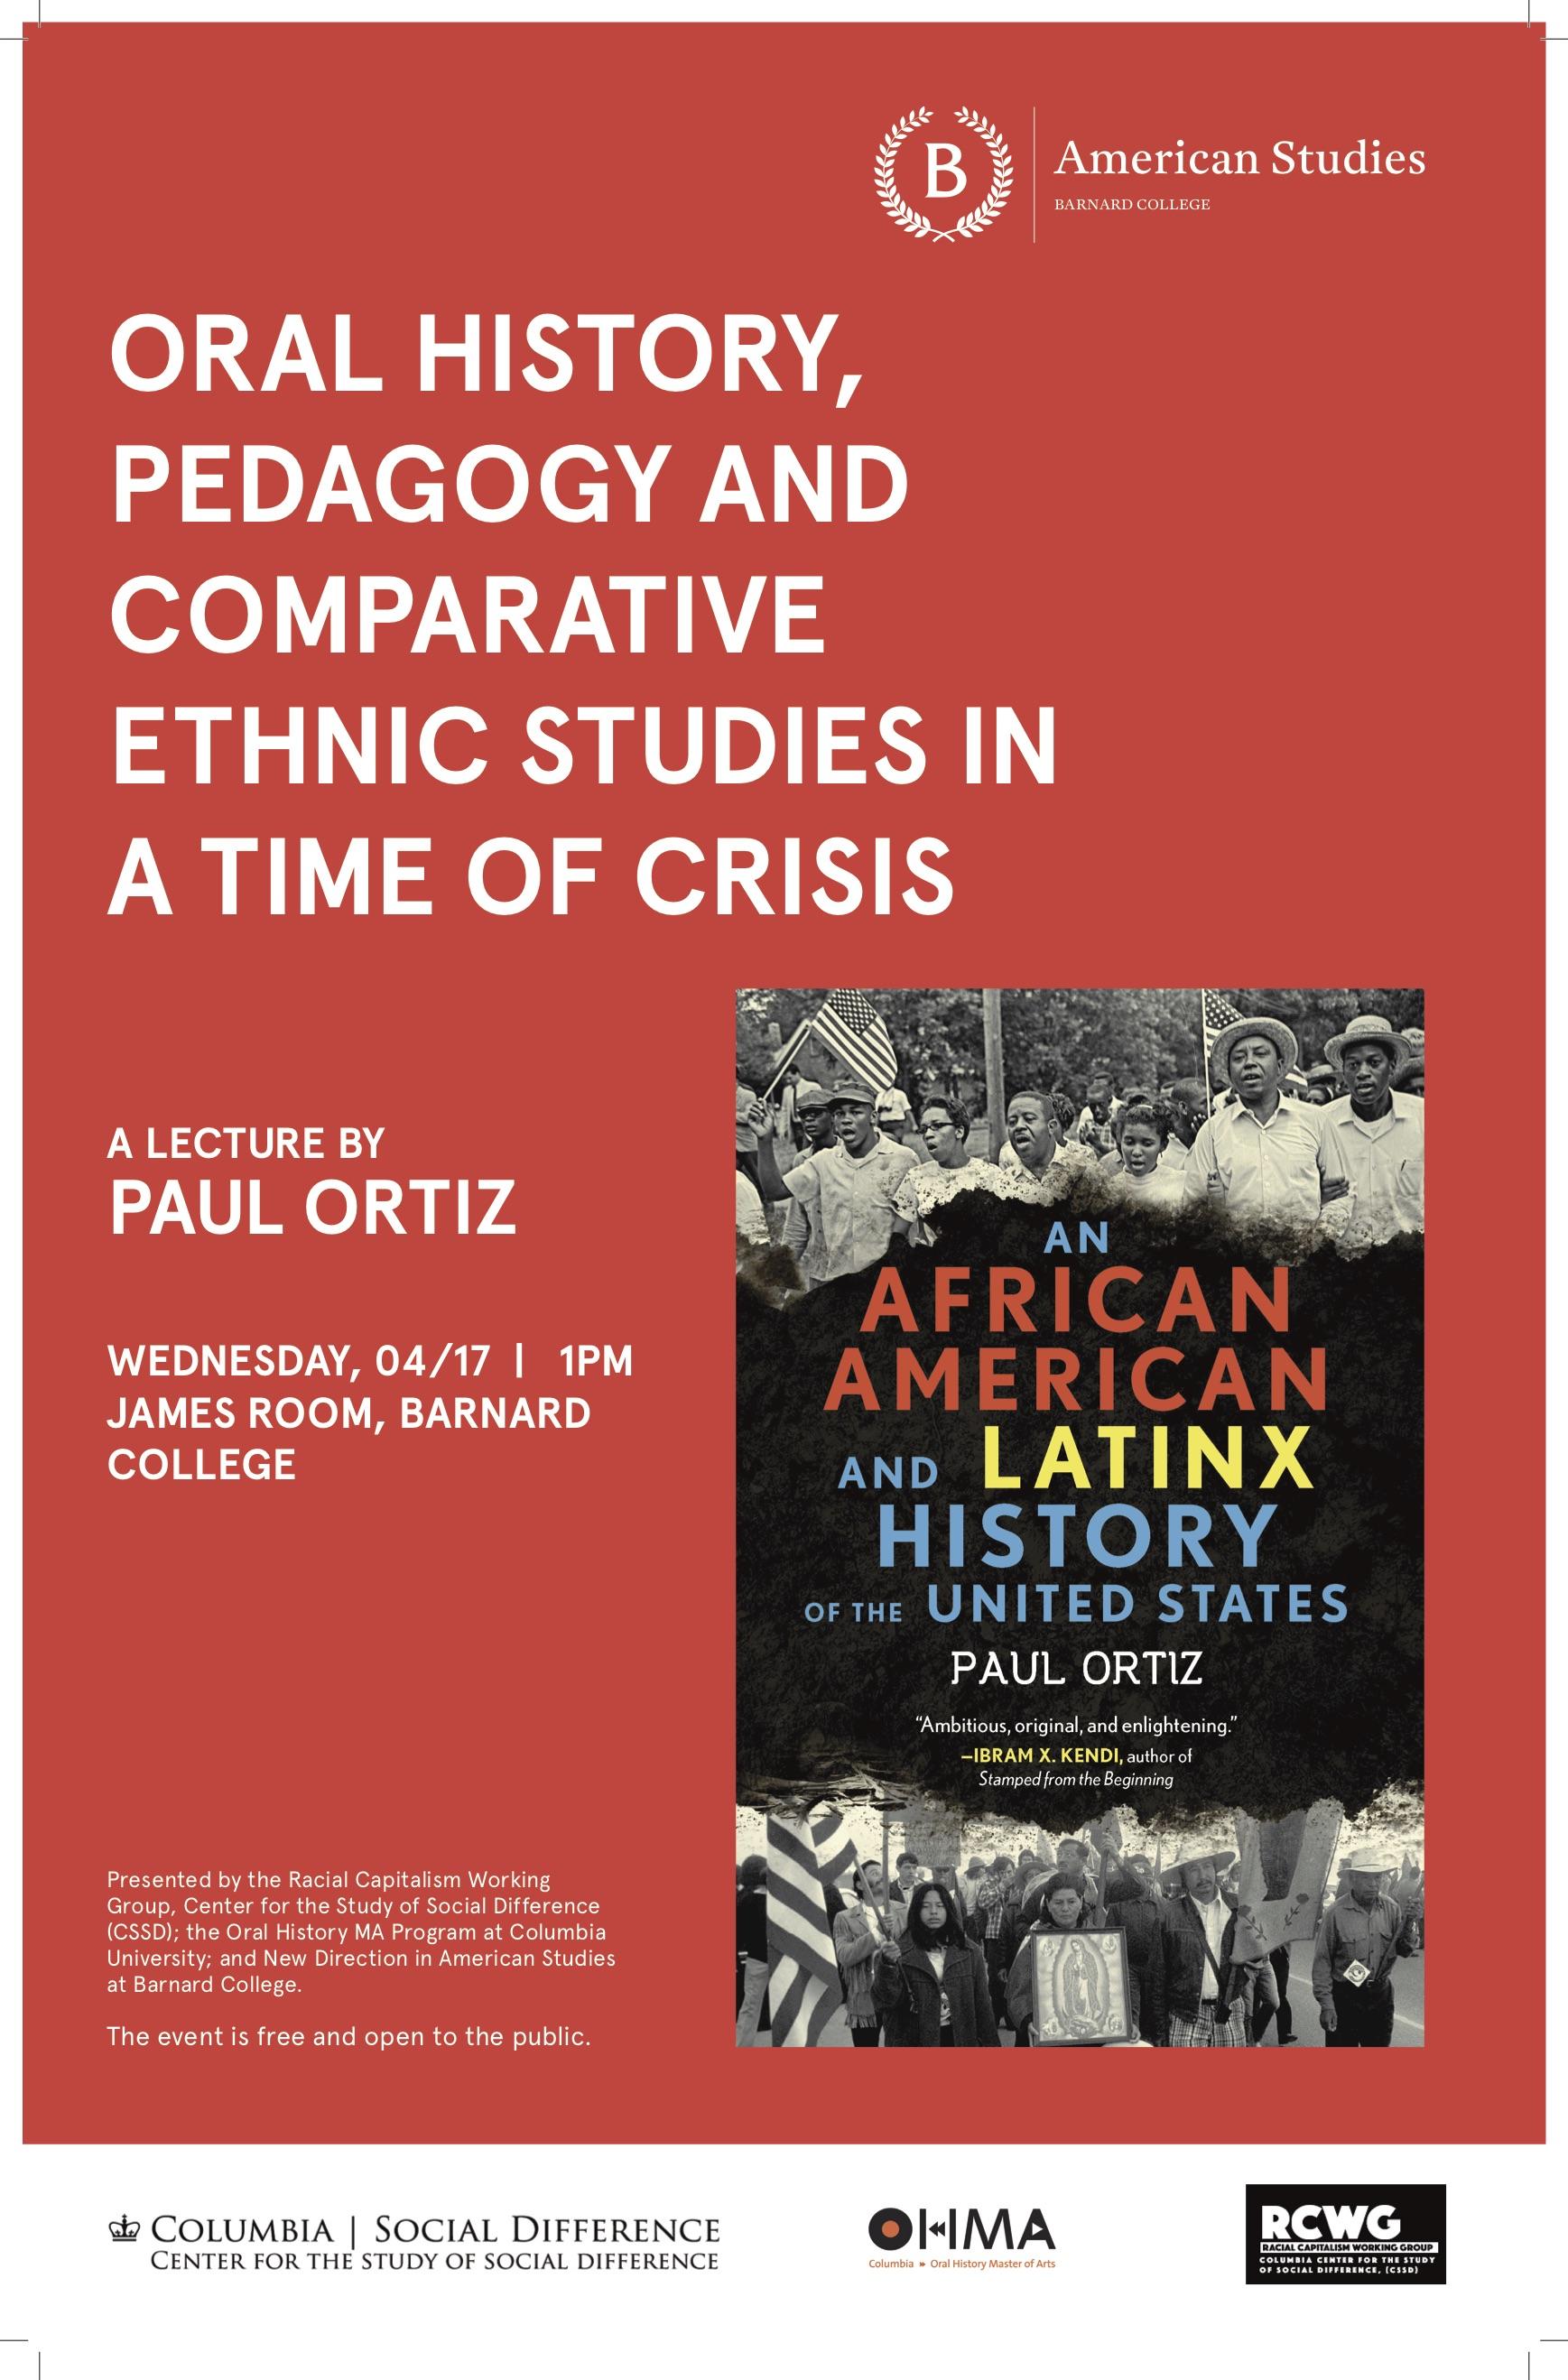 0417-Oral History Pedagogy Comparative Ethnic Studies-v1.jpg